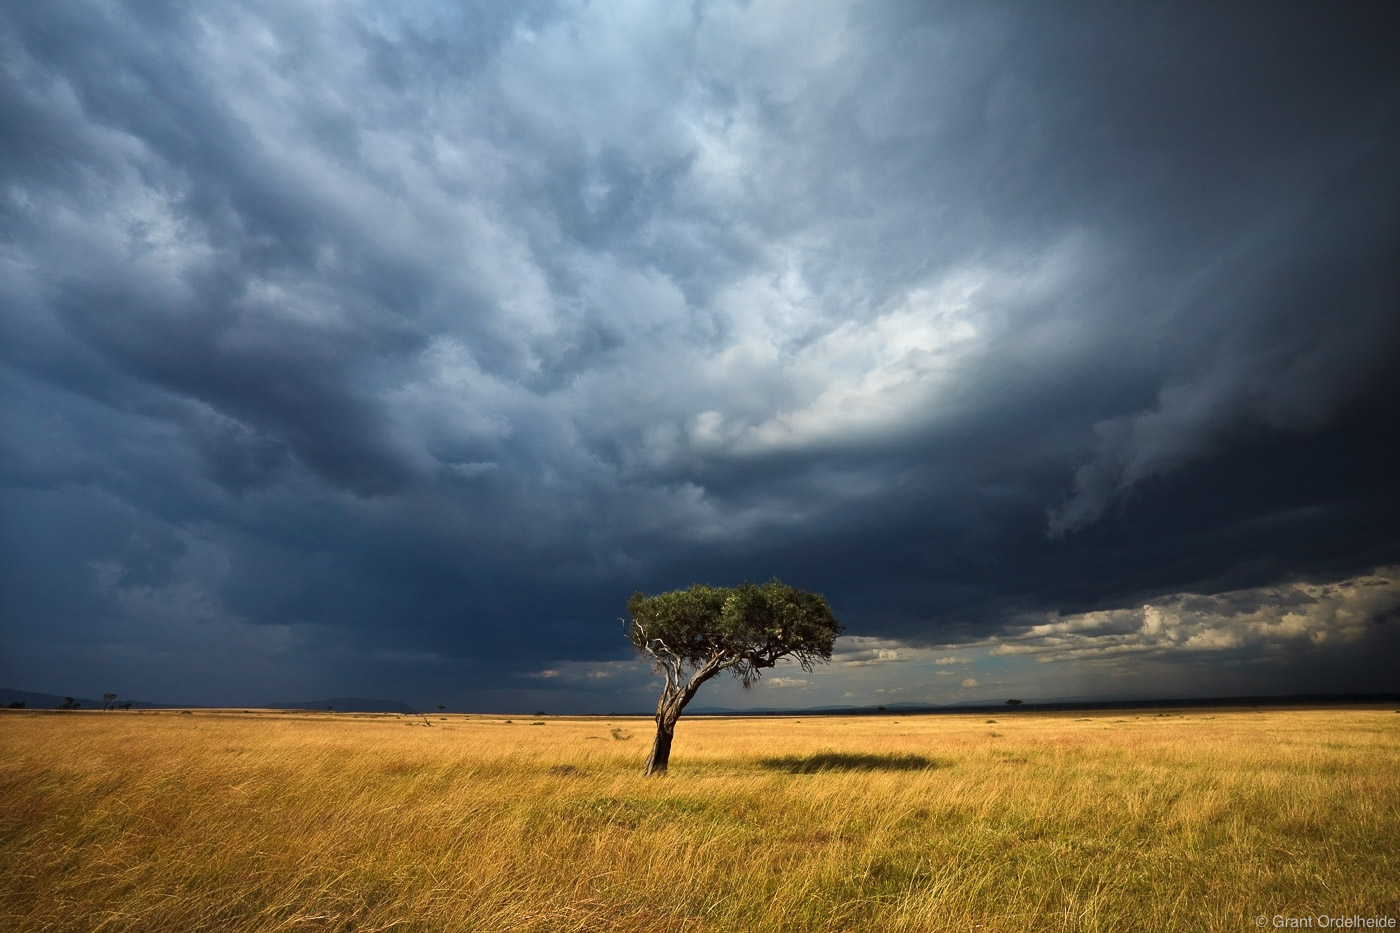 A lone acacia tree below an impending storm in Kenya's Masai Mara.